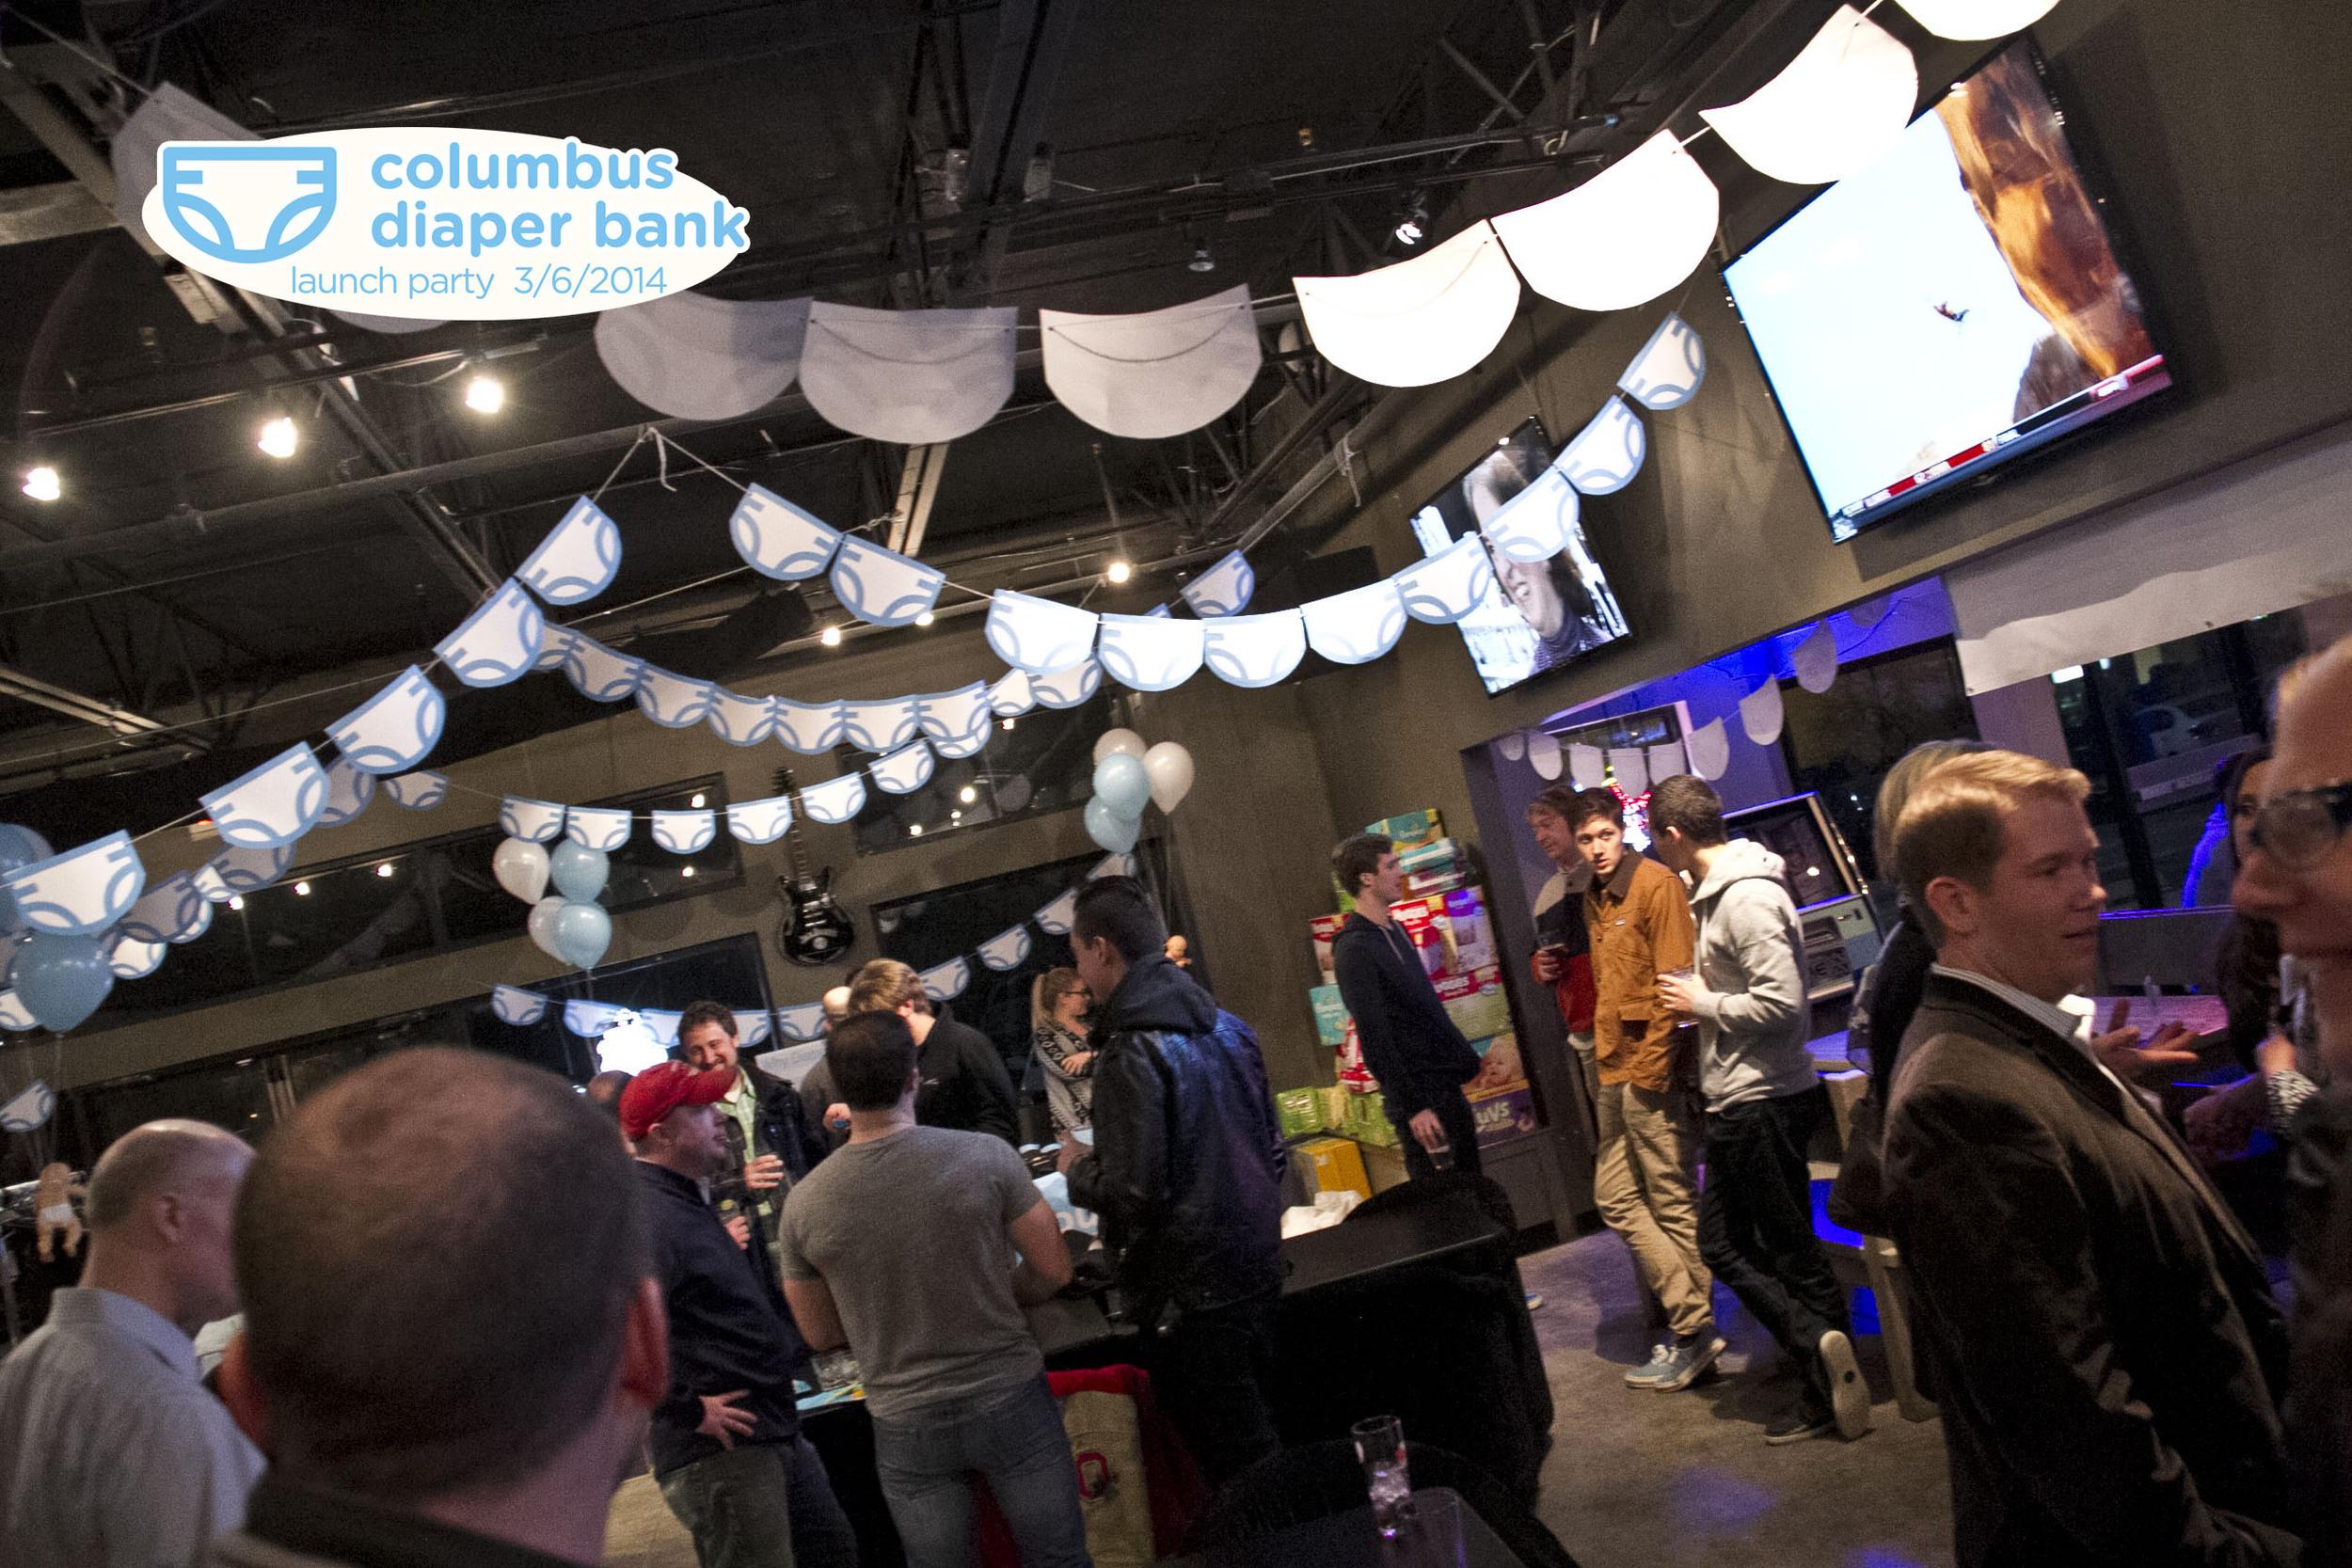 CDB Launch Party 2013-03-06 039.jpg